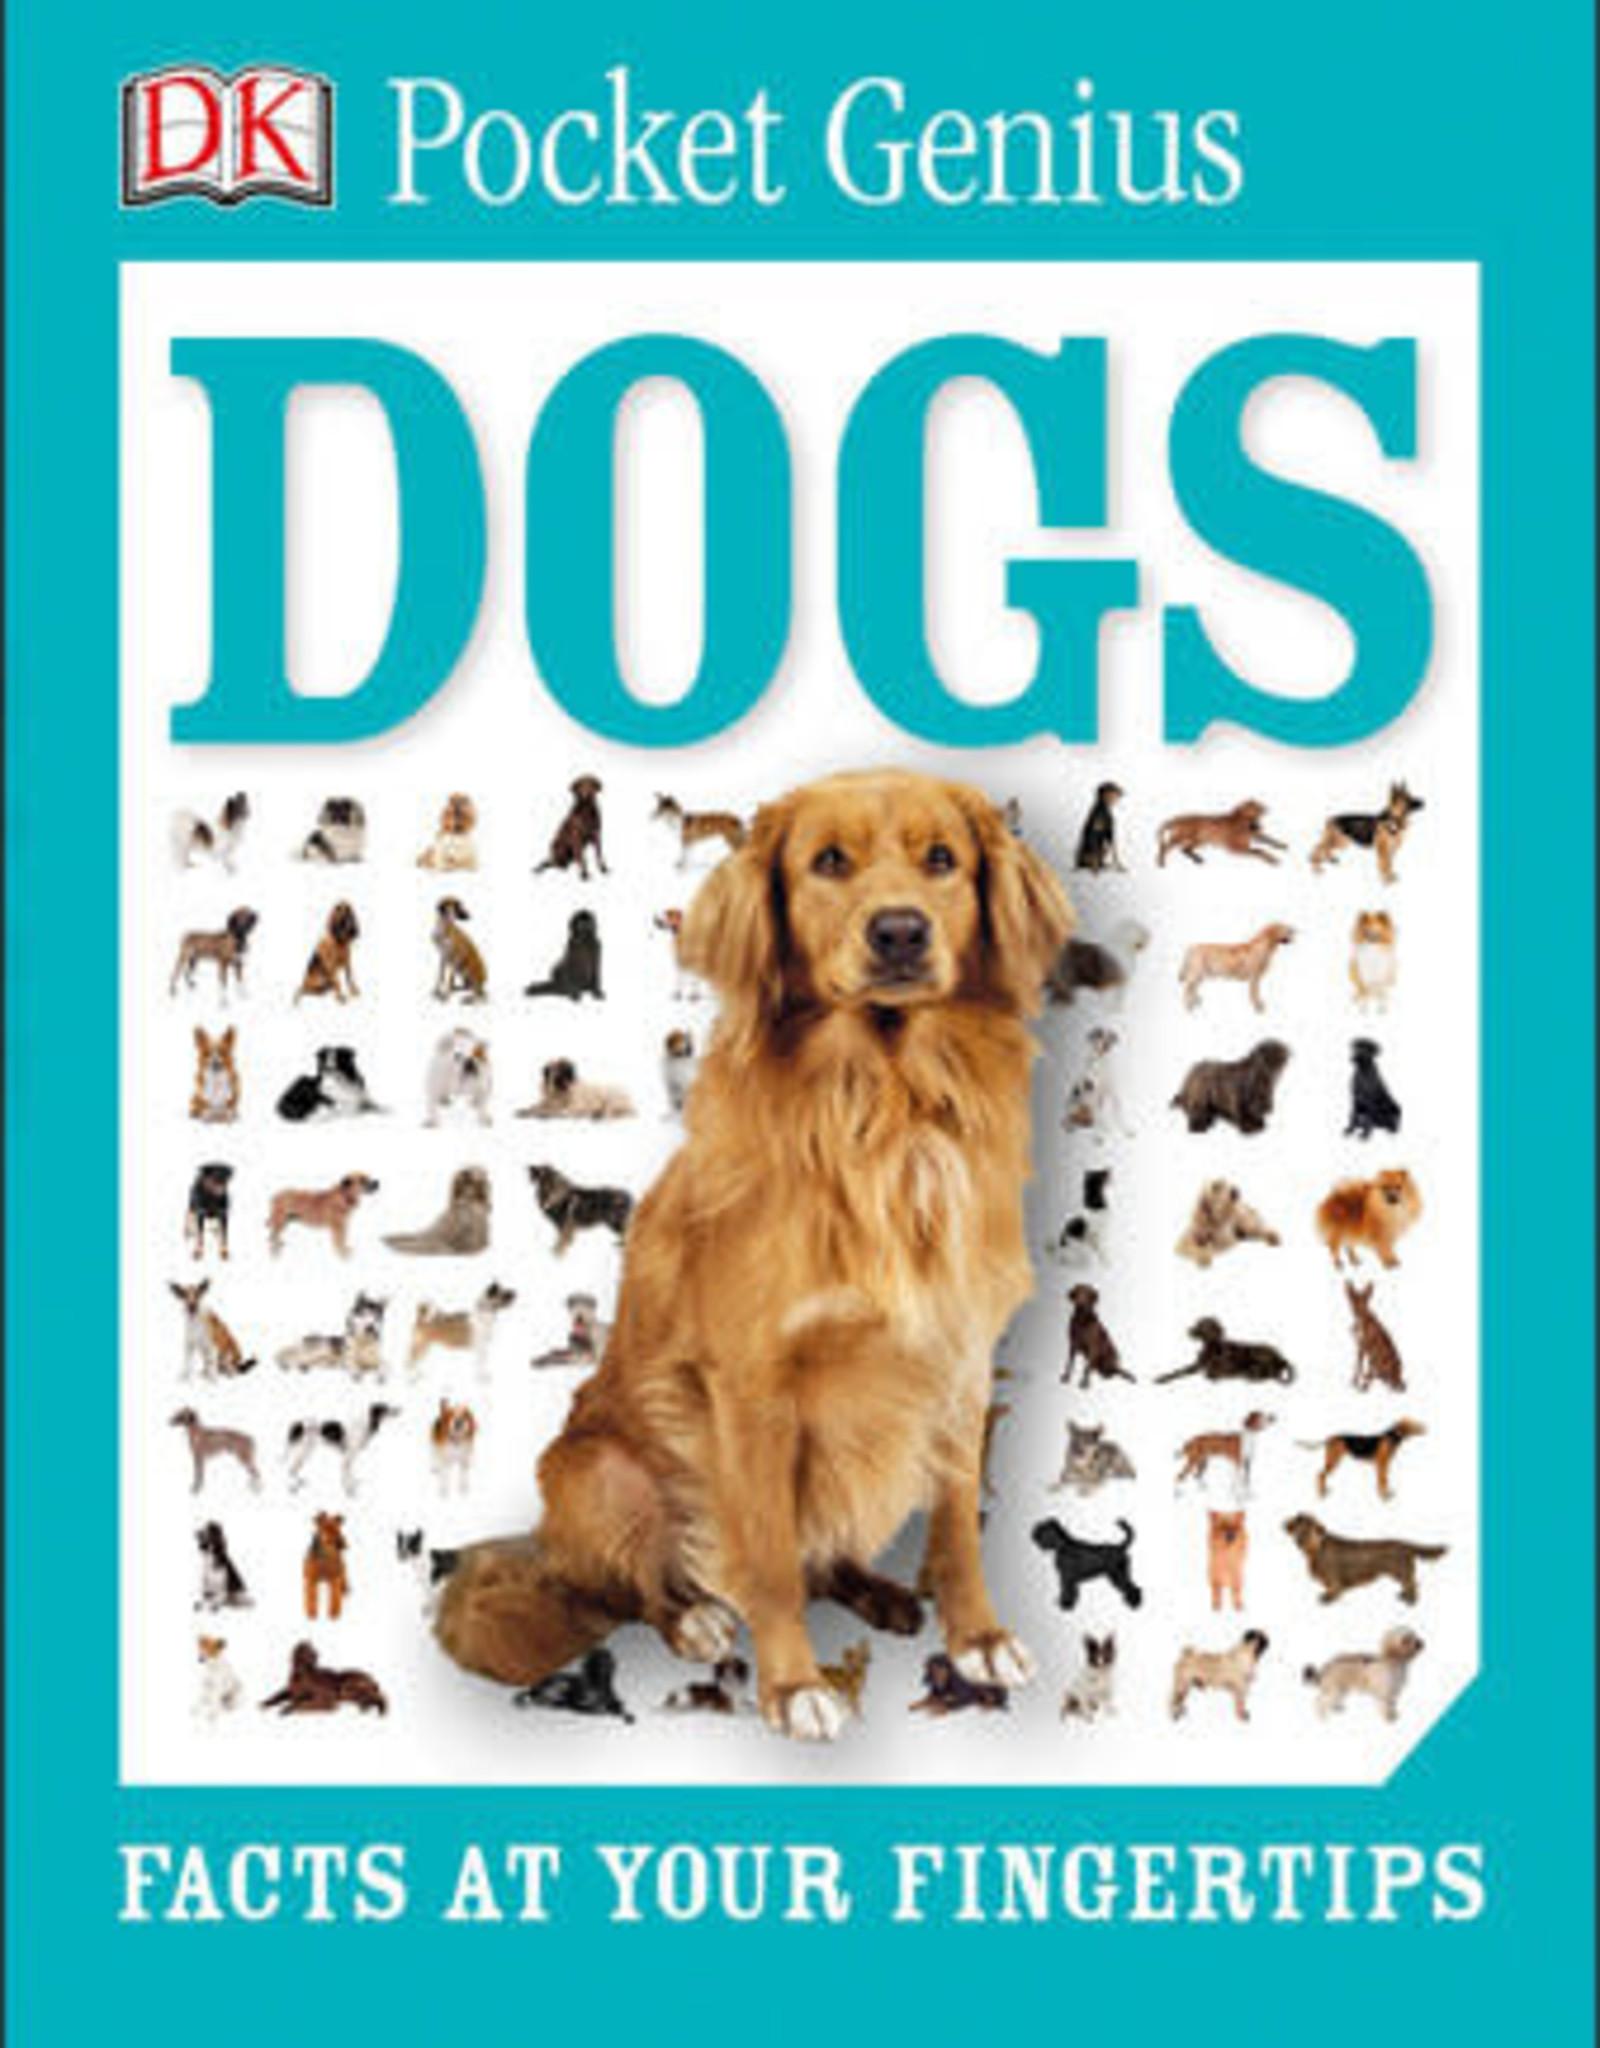 DK Pocket Genius Dogs